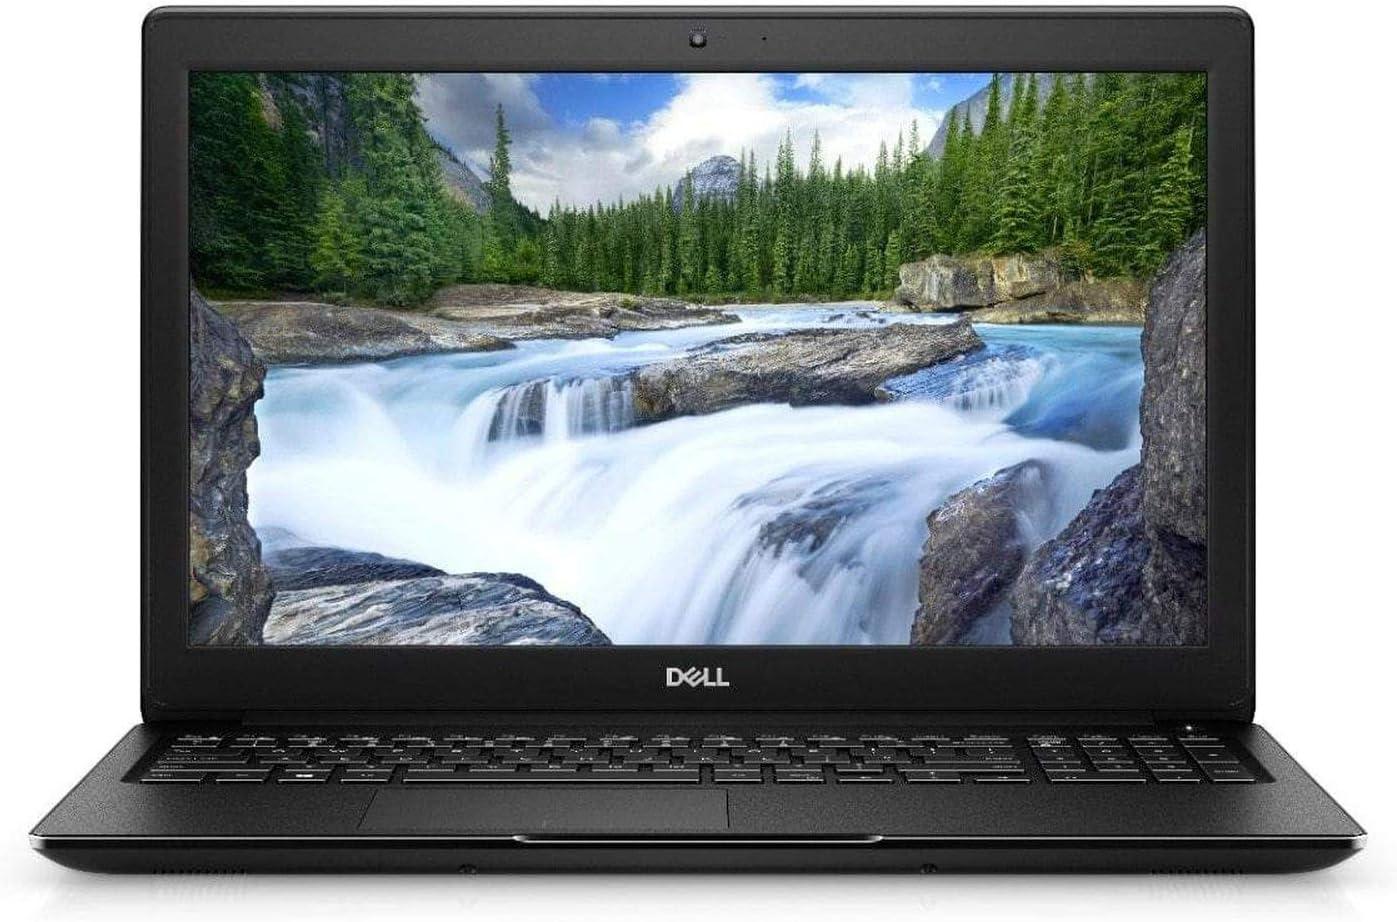 Dell Latitude 3500 Laptop 15.6 - Intel Core i3 8th Gen - i3-8145U - Dual Core 3.9Ghz - 128GB SSD - 4GB RAM - 1366x768 HD - Windows 10 Pro (Renewed)